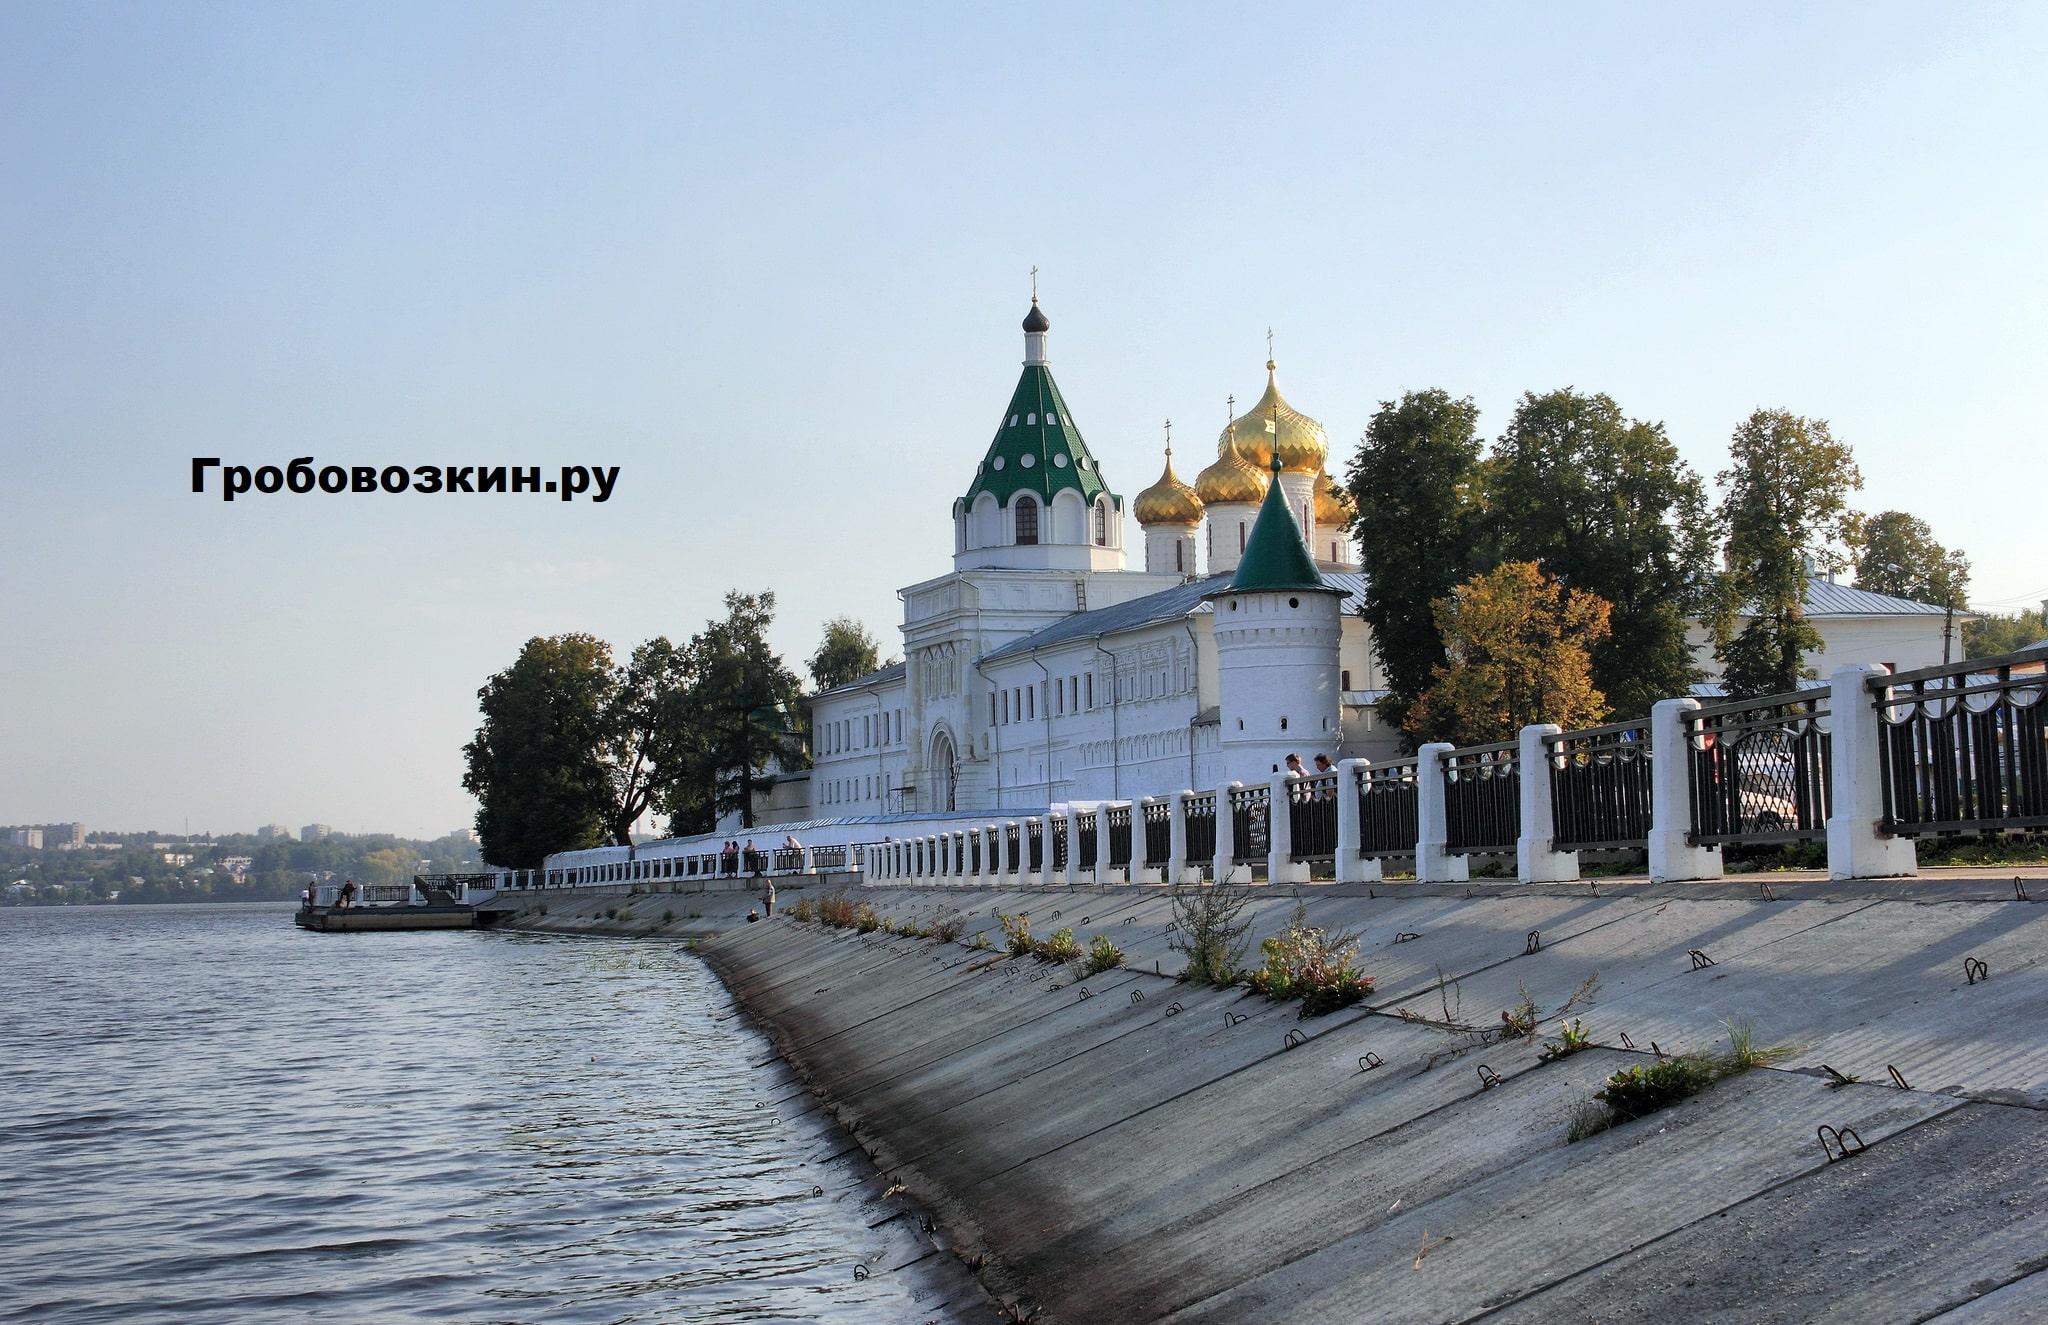 Перевозка умершего, умершей, гроба, груза 200 Москва Кострома.